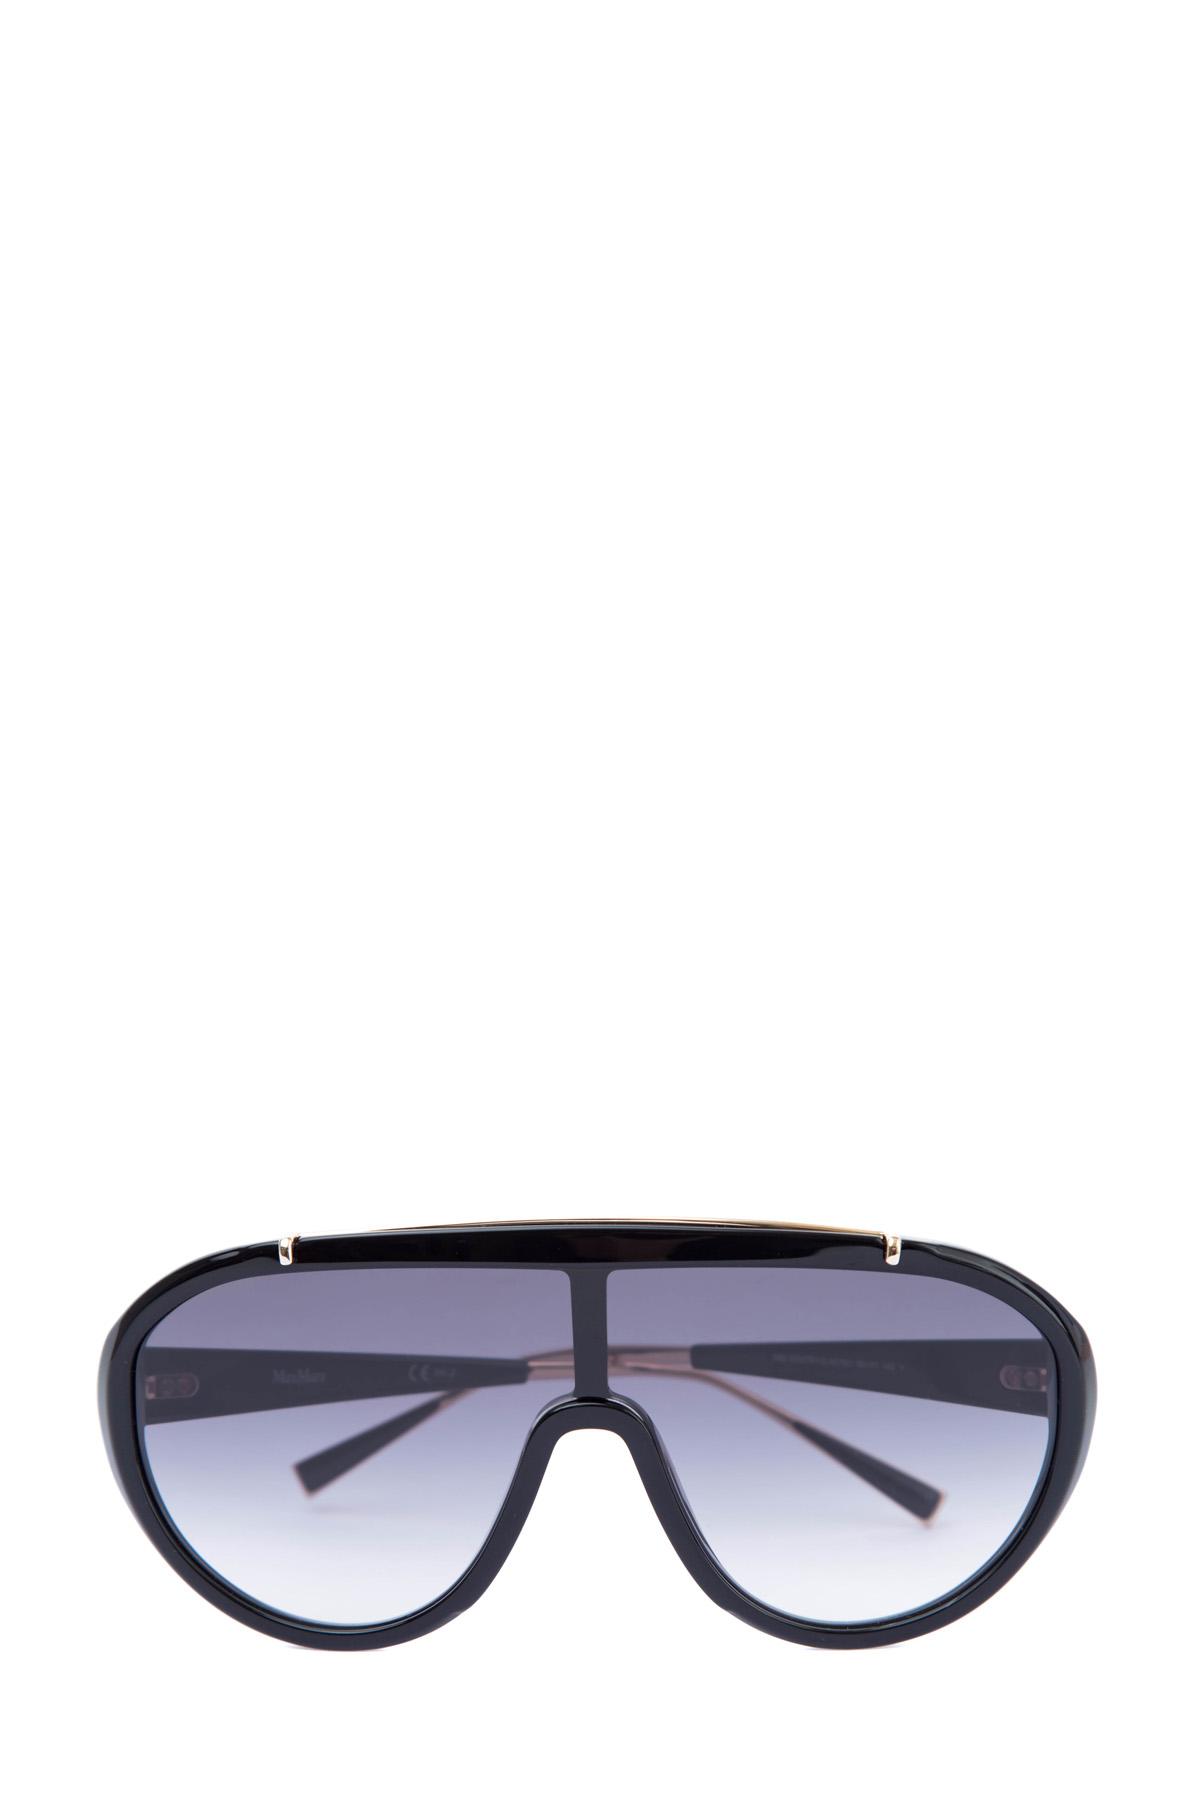 Купить Очки, MAX MARA (sunglasses), Италия, пластик 100%, стекло 100%